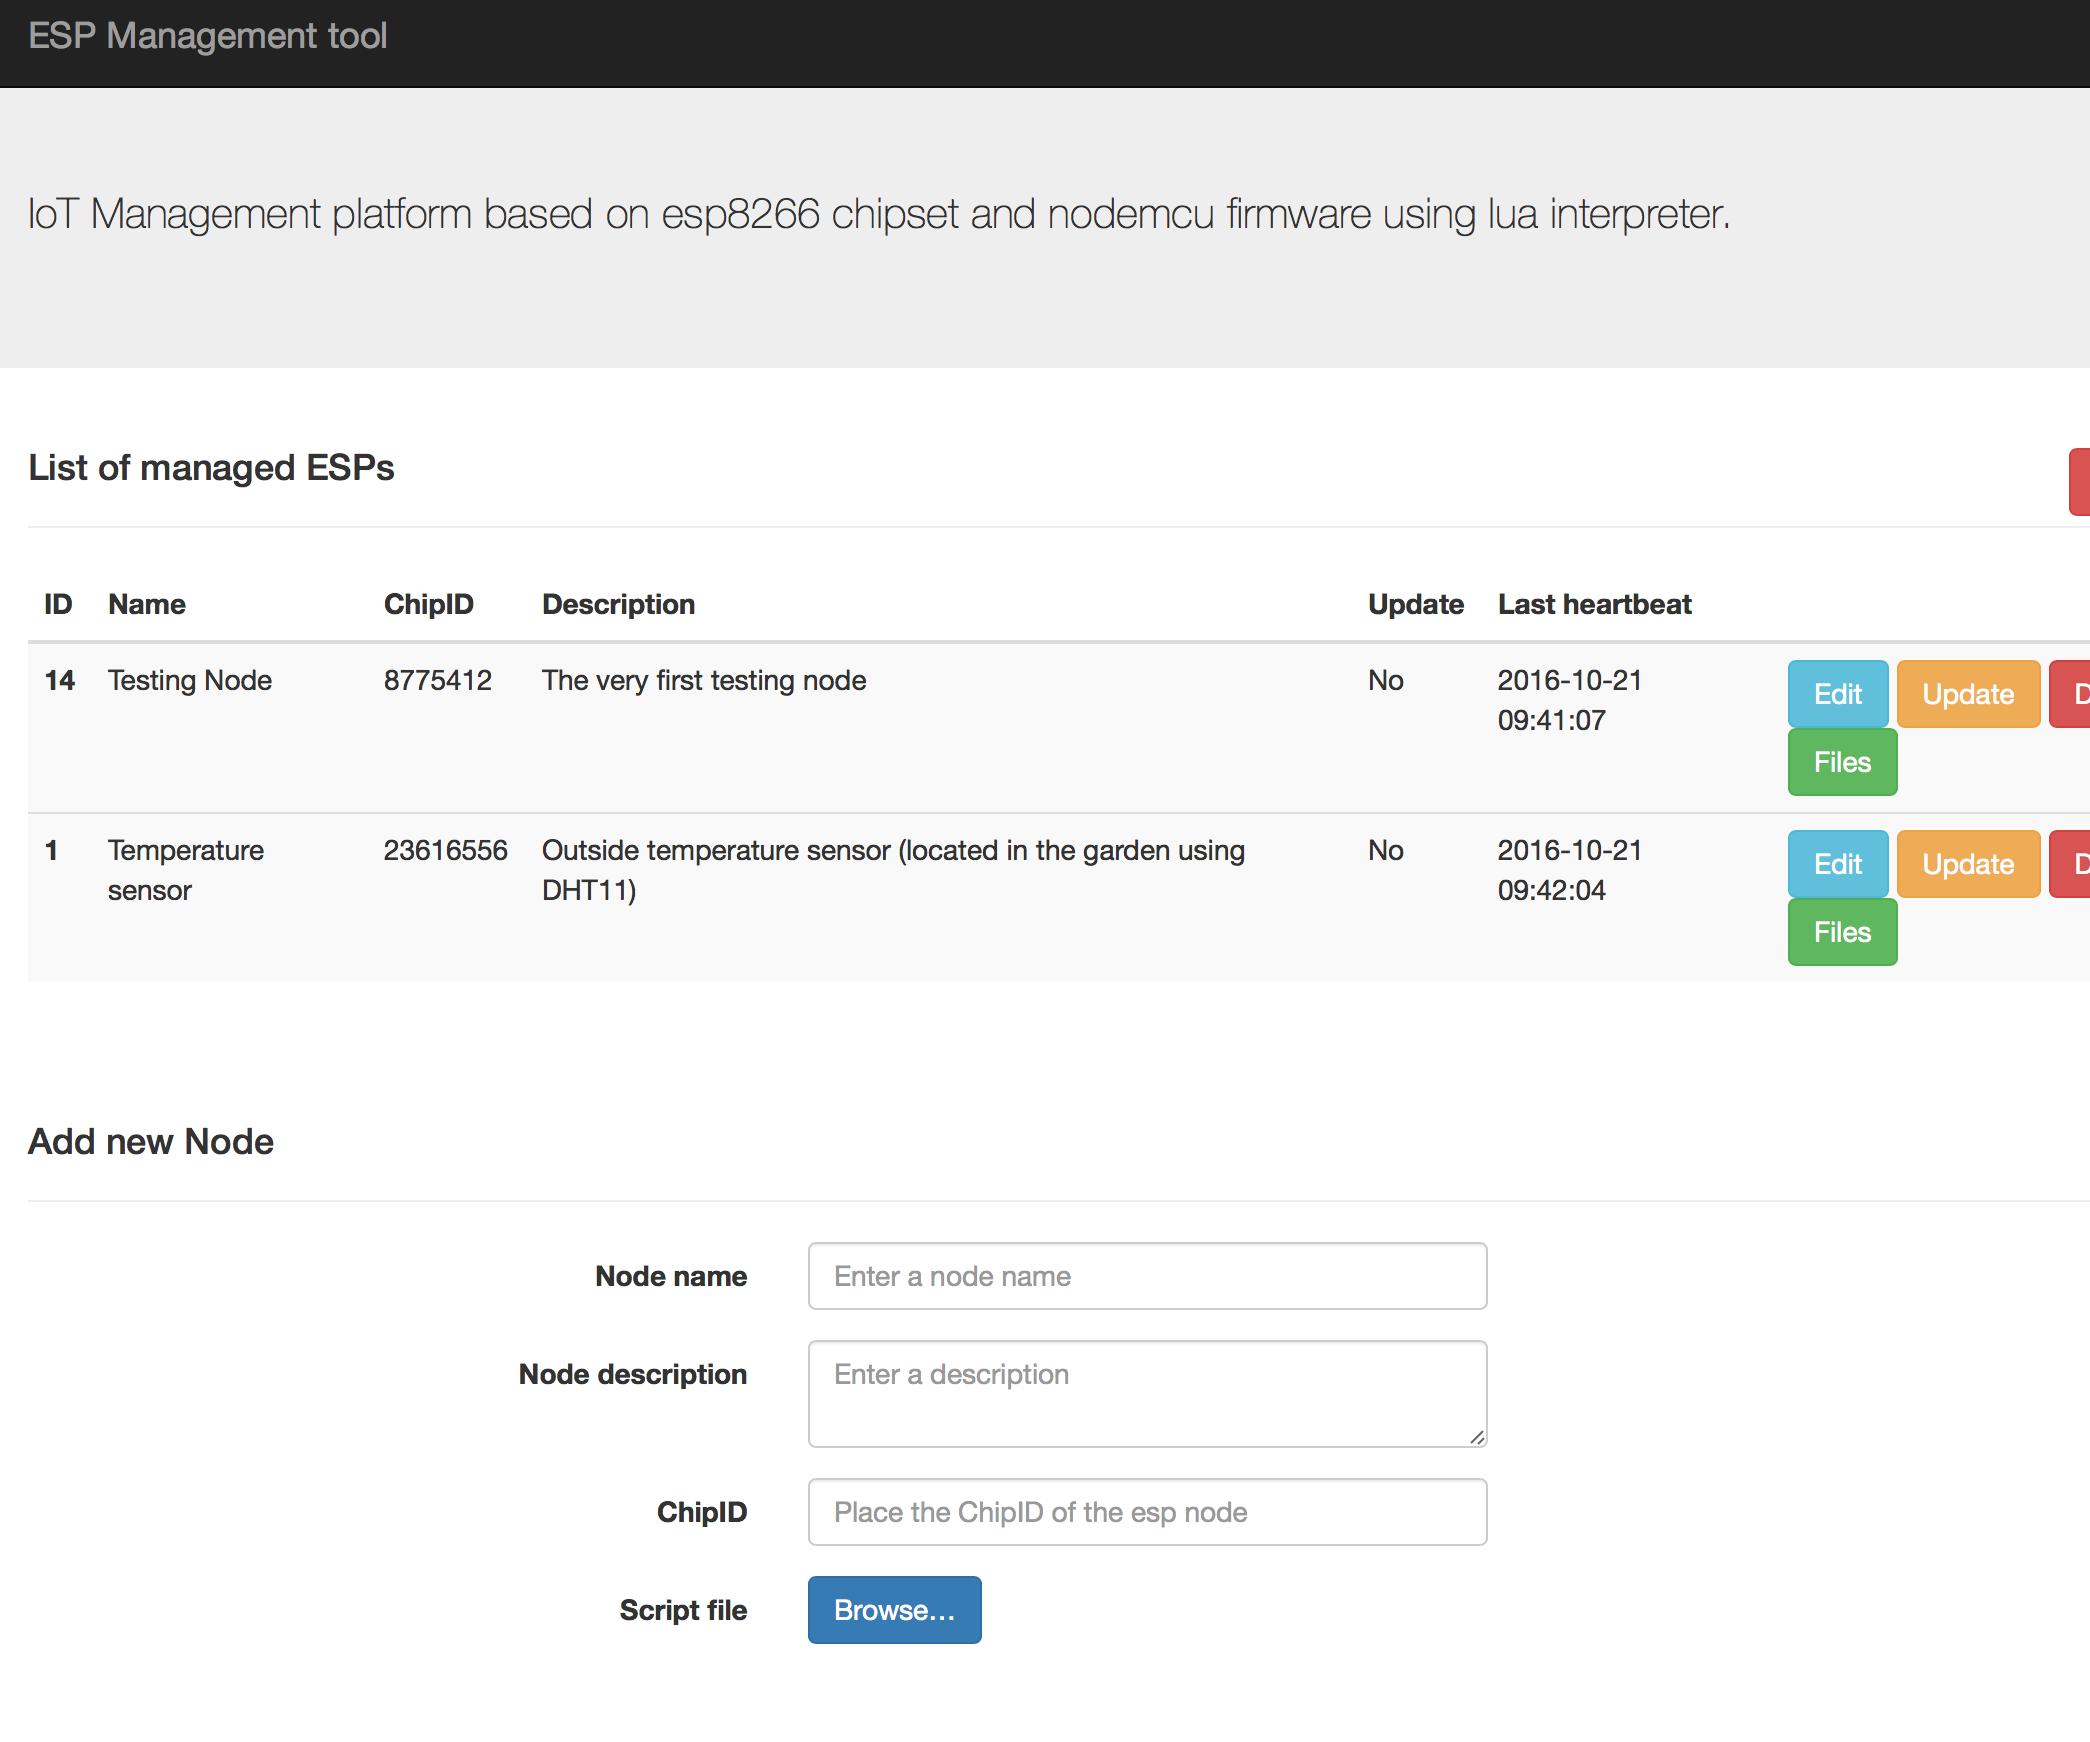 ESP8266 OTA LUA with WEB UI MANAGEMENT / Nodemcu firmware